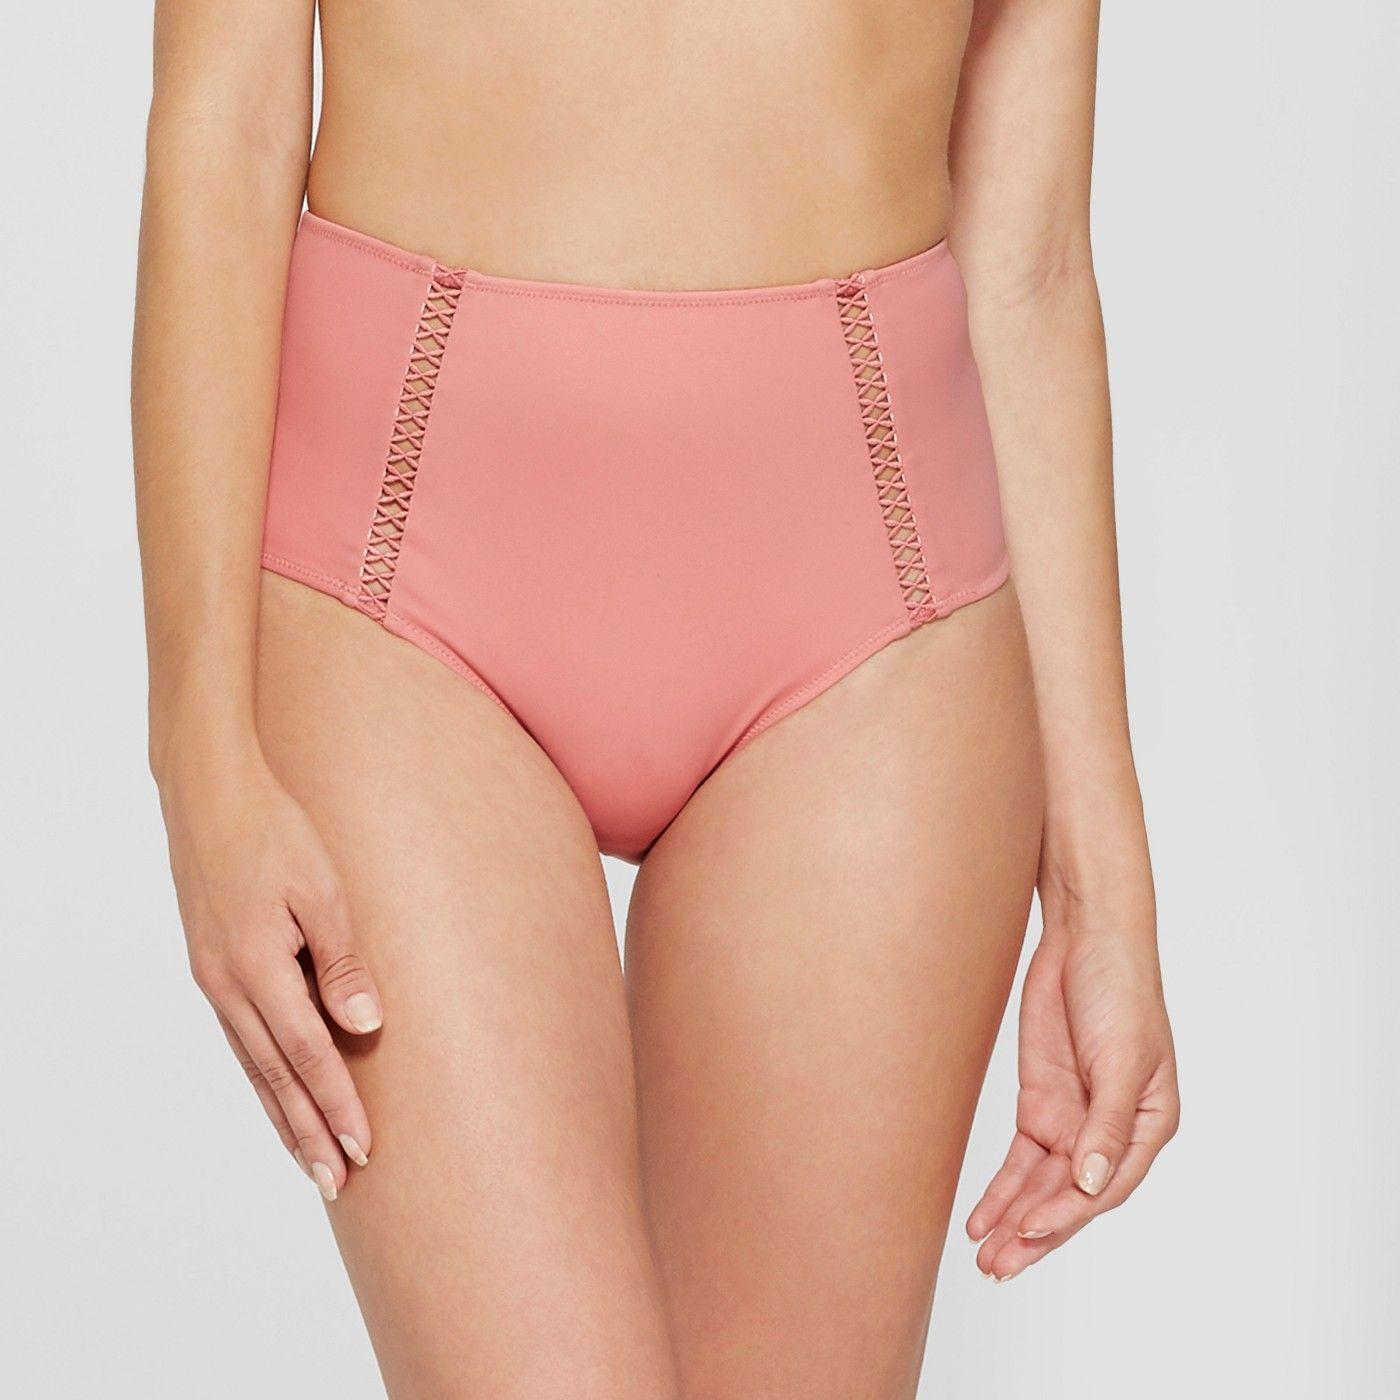 75ab20d780e7d Women s Beach High Waist Crochet Trim Bikini Bottom - Shade ...